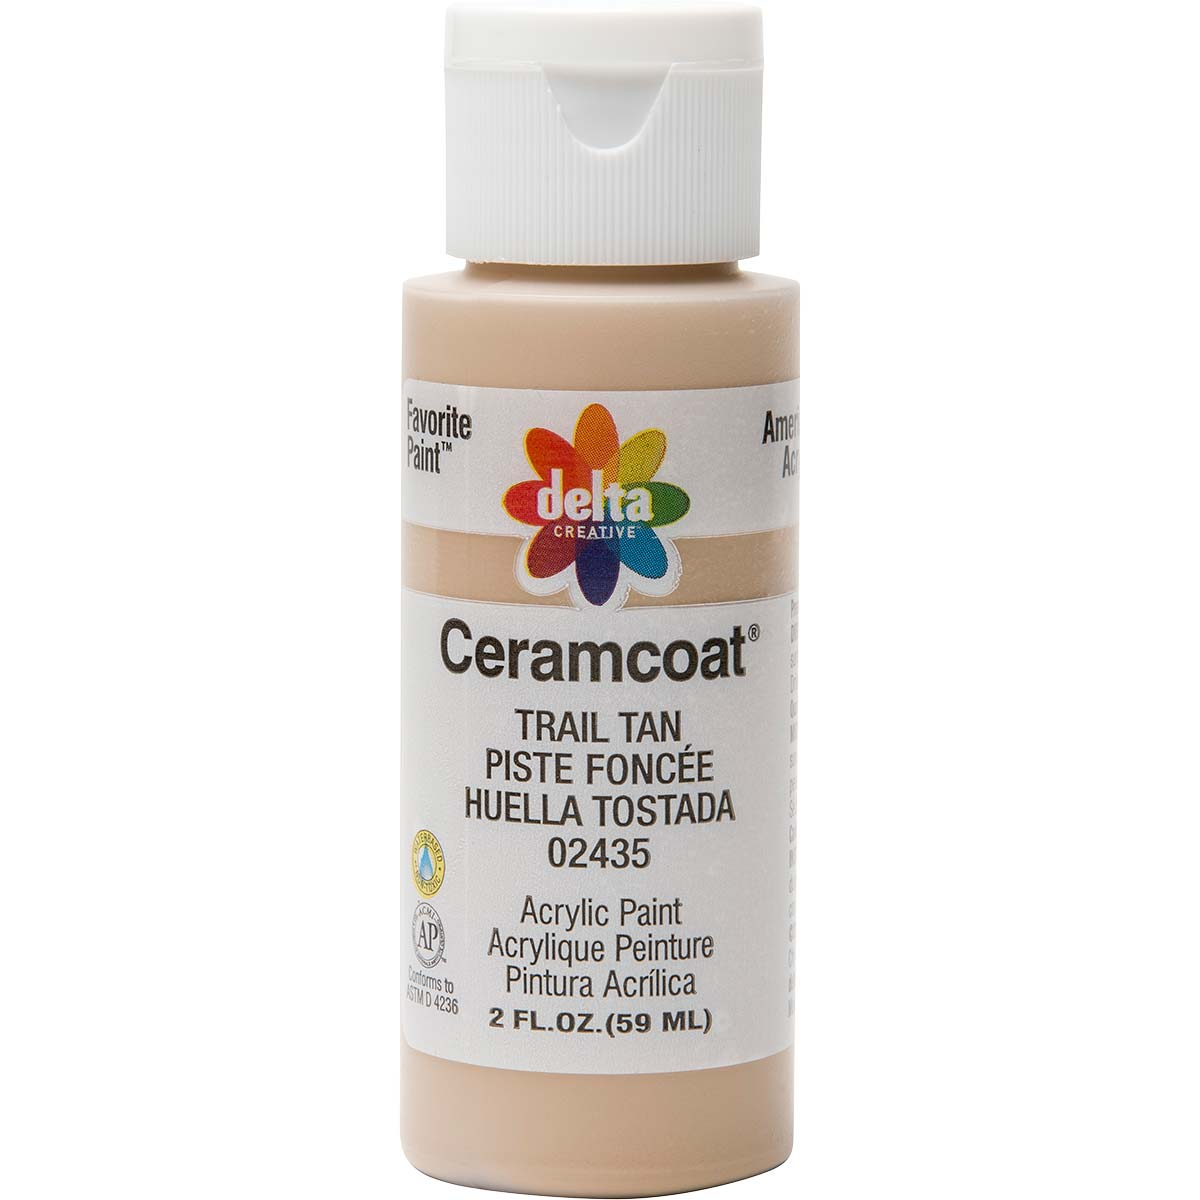 Delta Ceramcoat ® Acrylic Paint - Trail Tan, 2 oz.